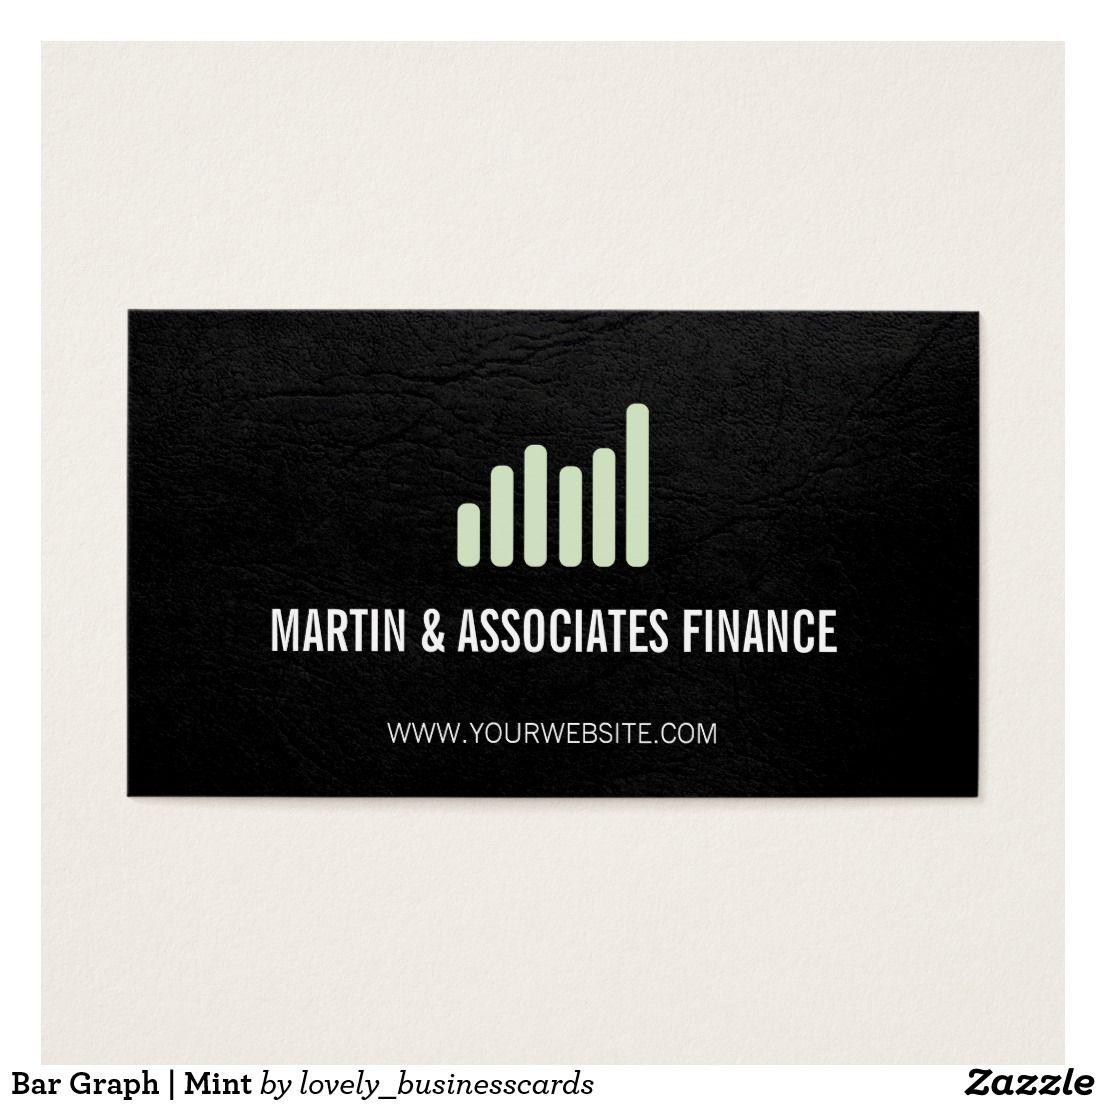 Bar Graph Mint Business Cards Find Under Finance